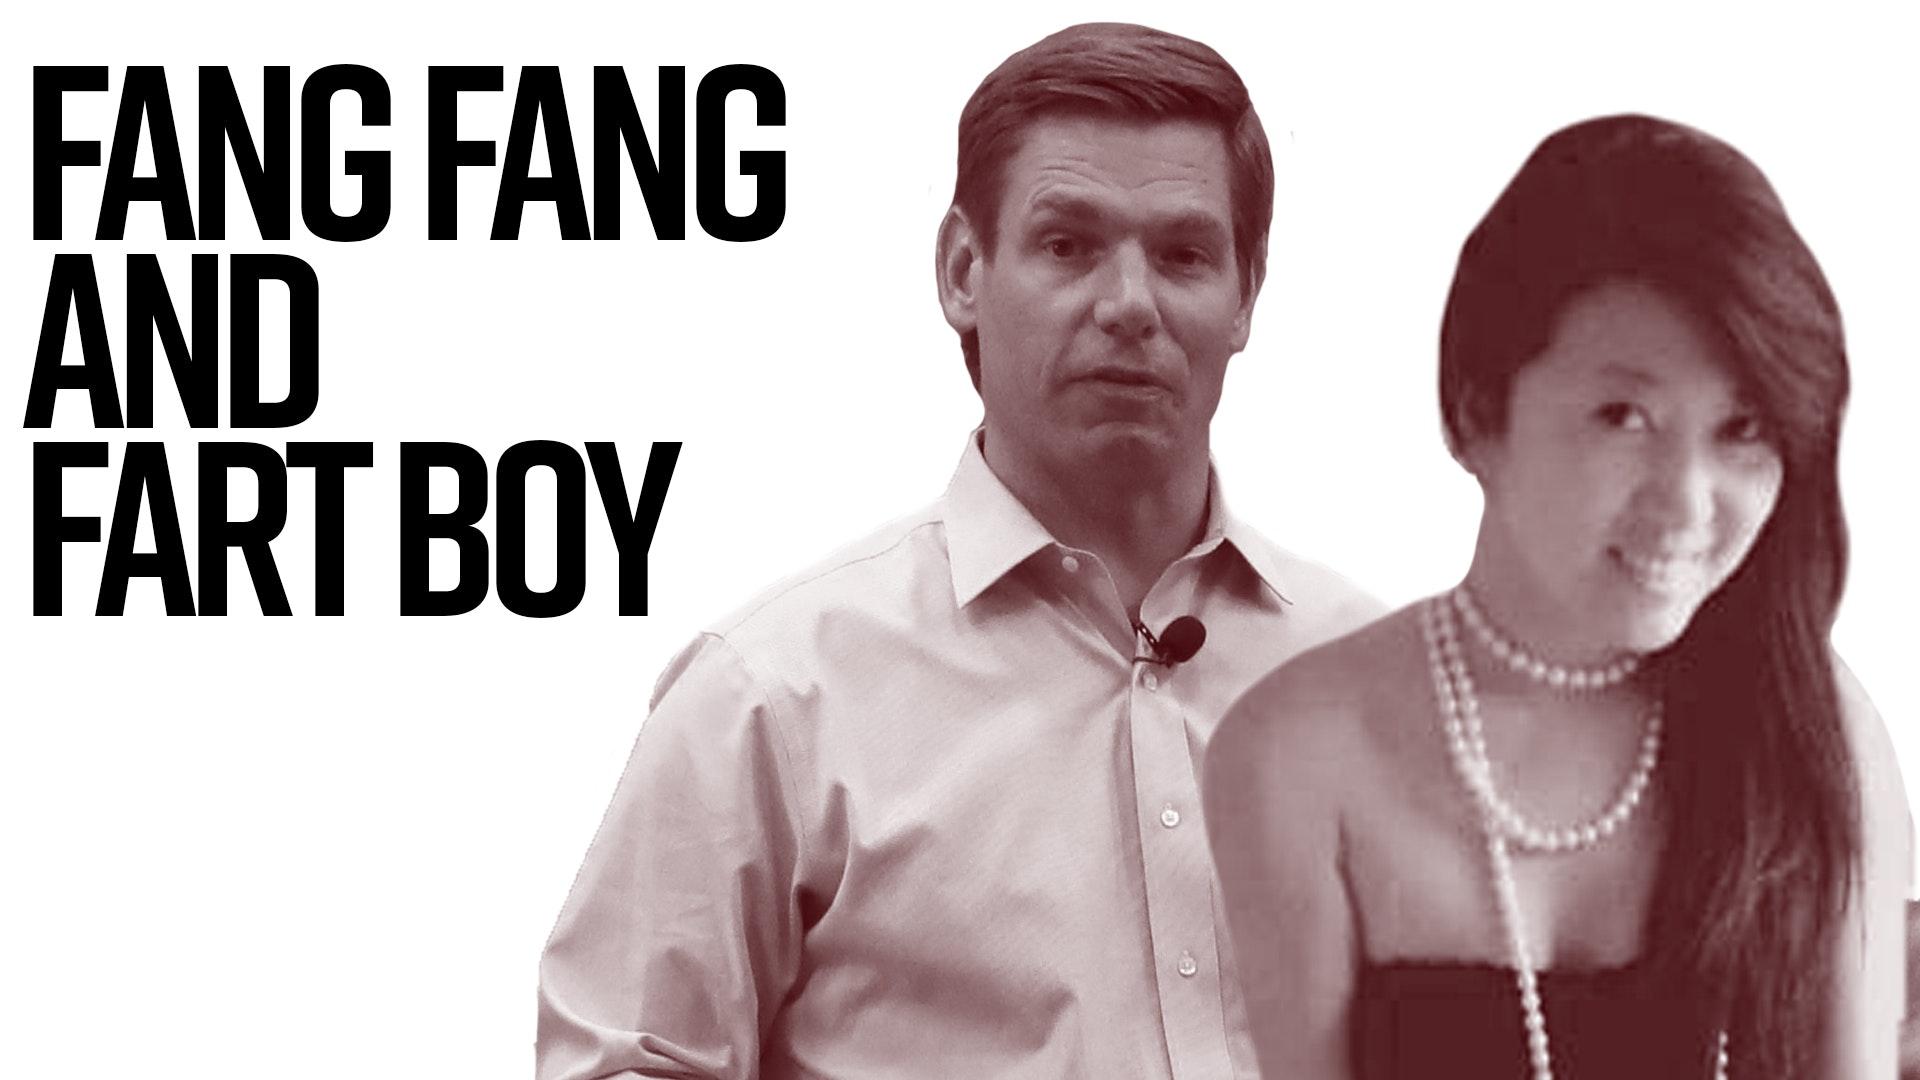 Ep. 1008 - Fang Fang and Fart Boy